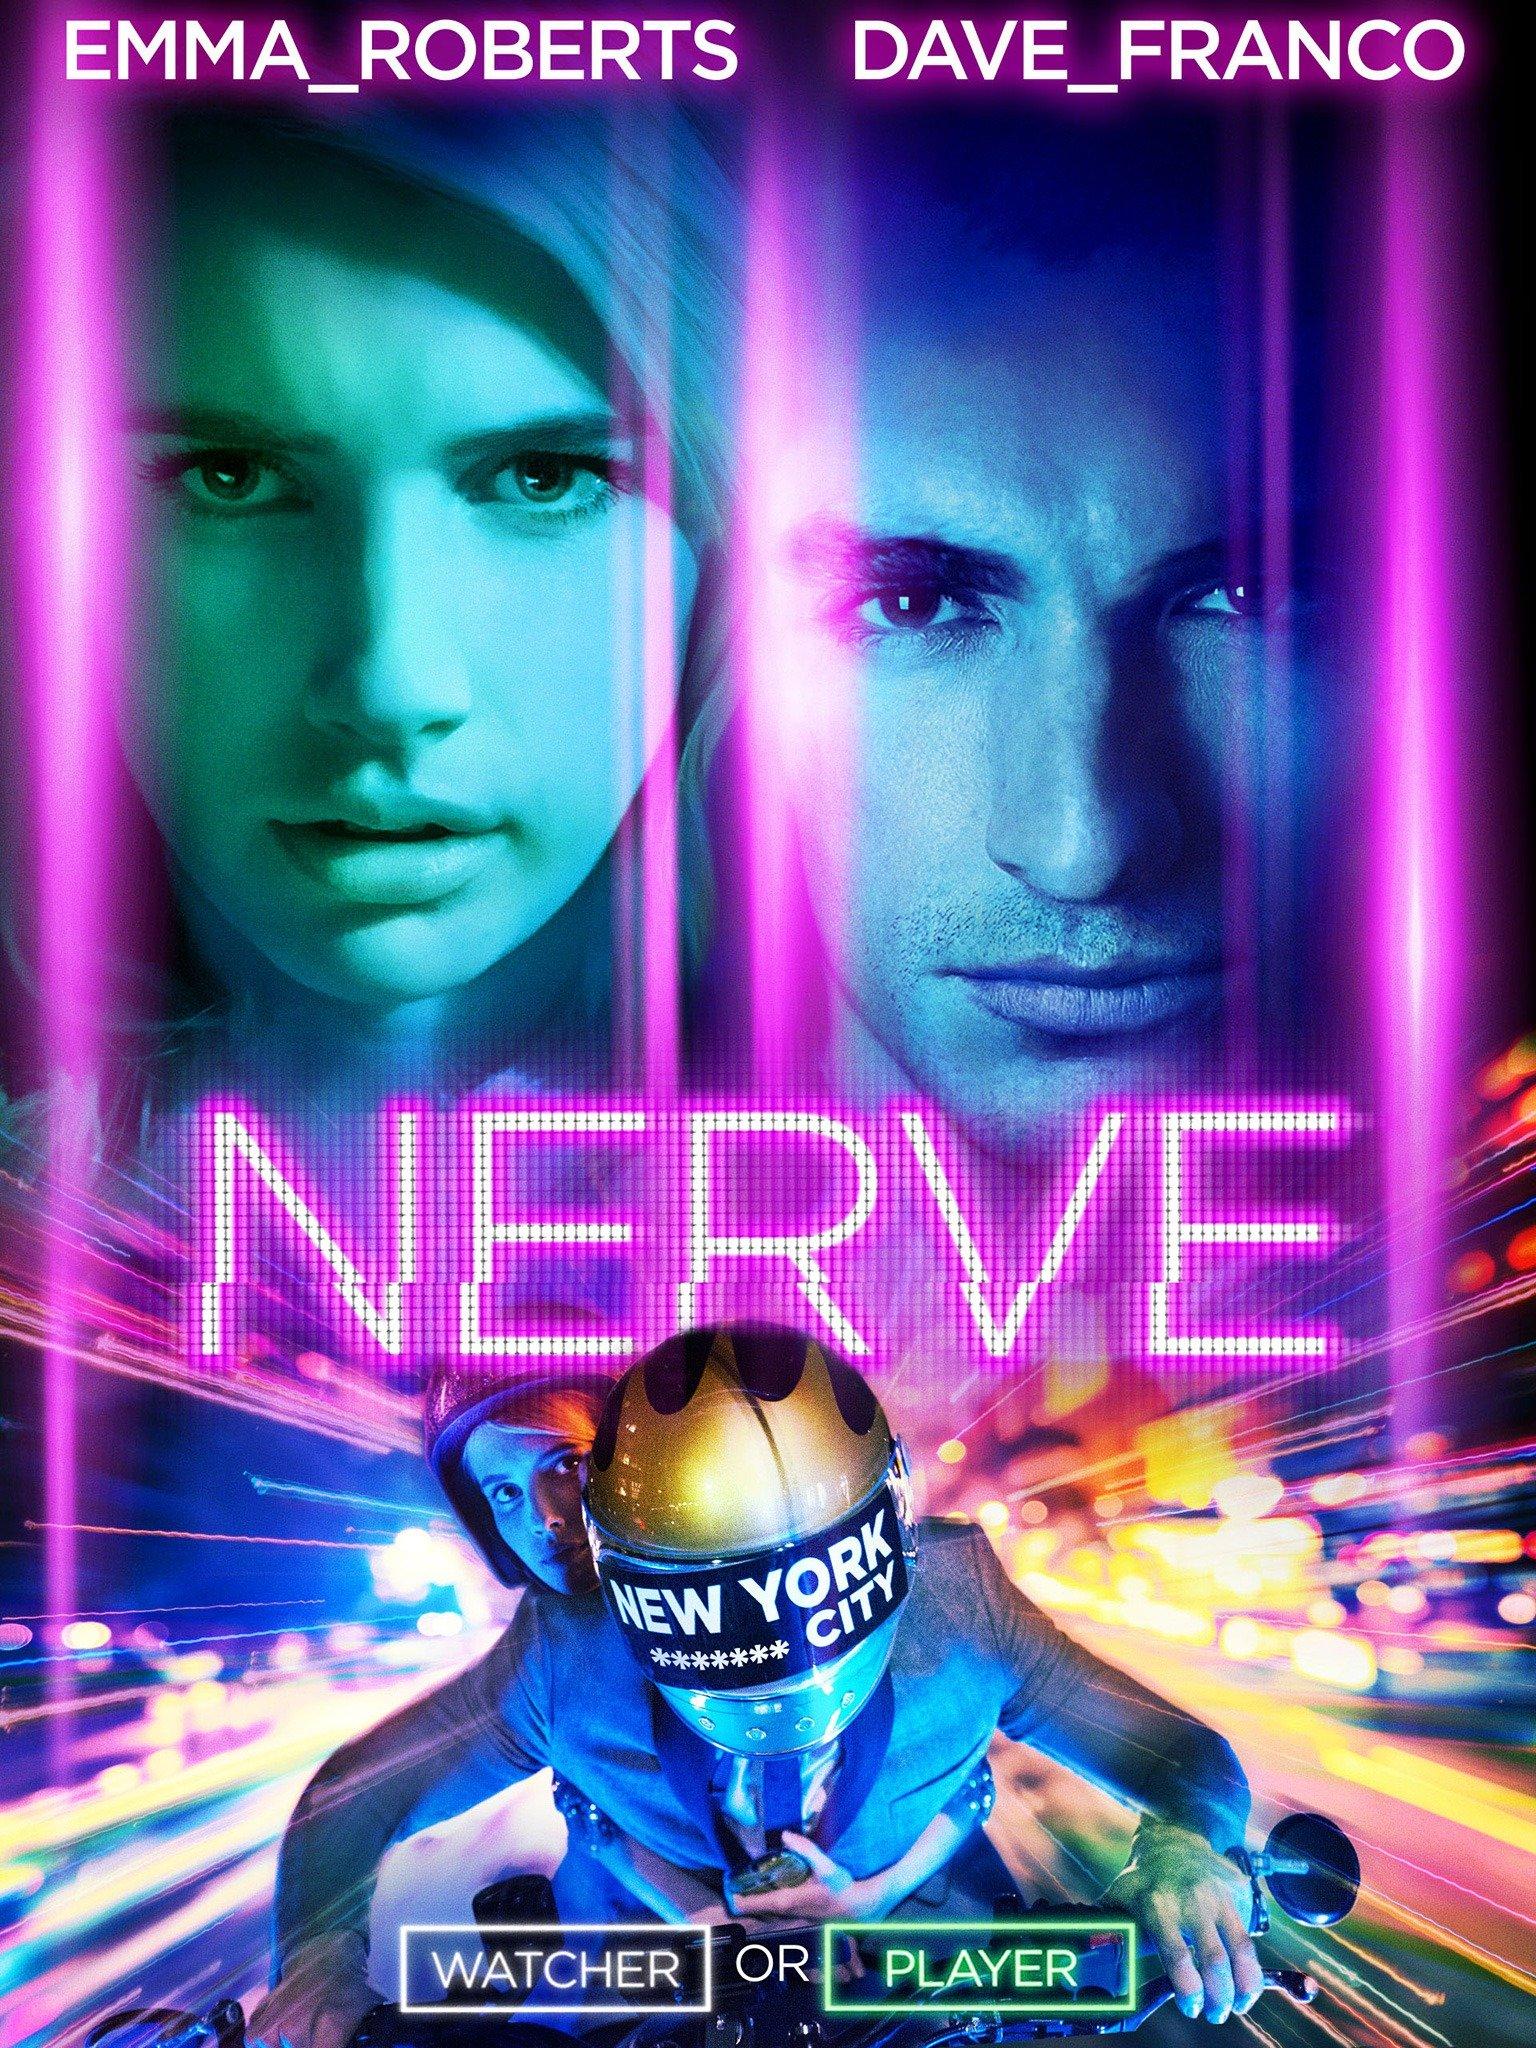 Nerve: tra virtuale e reale